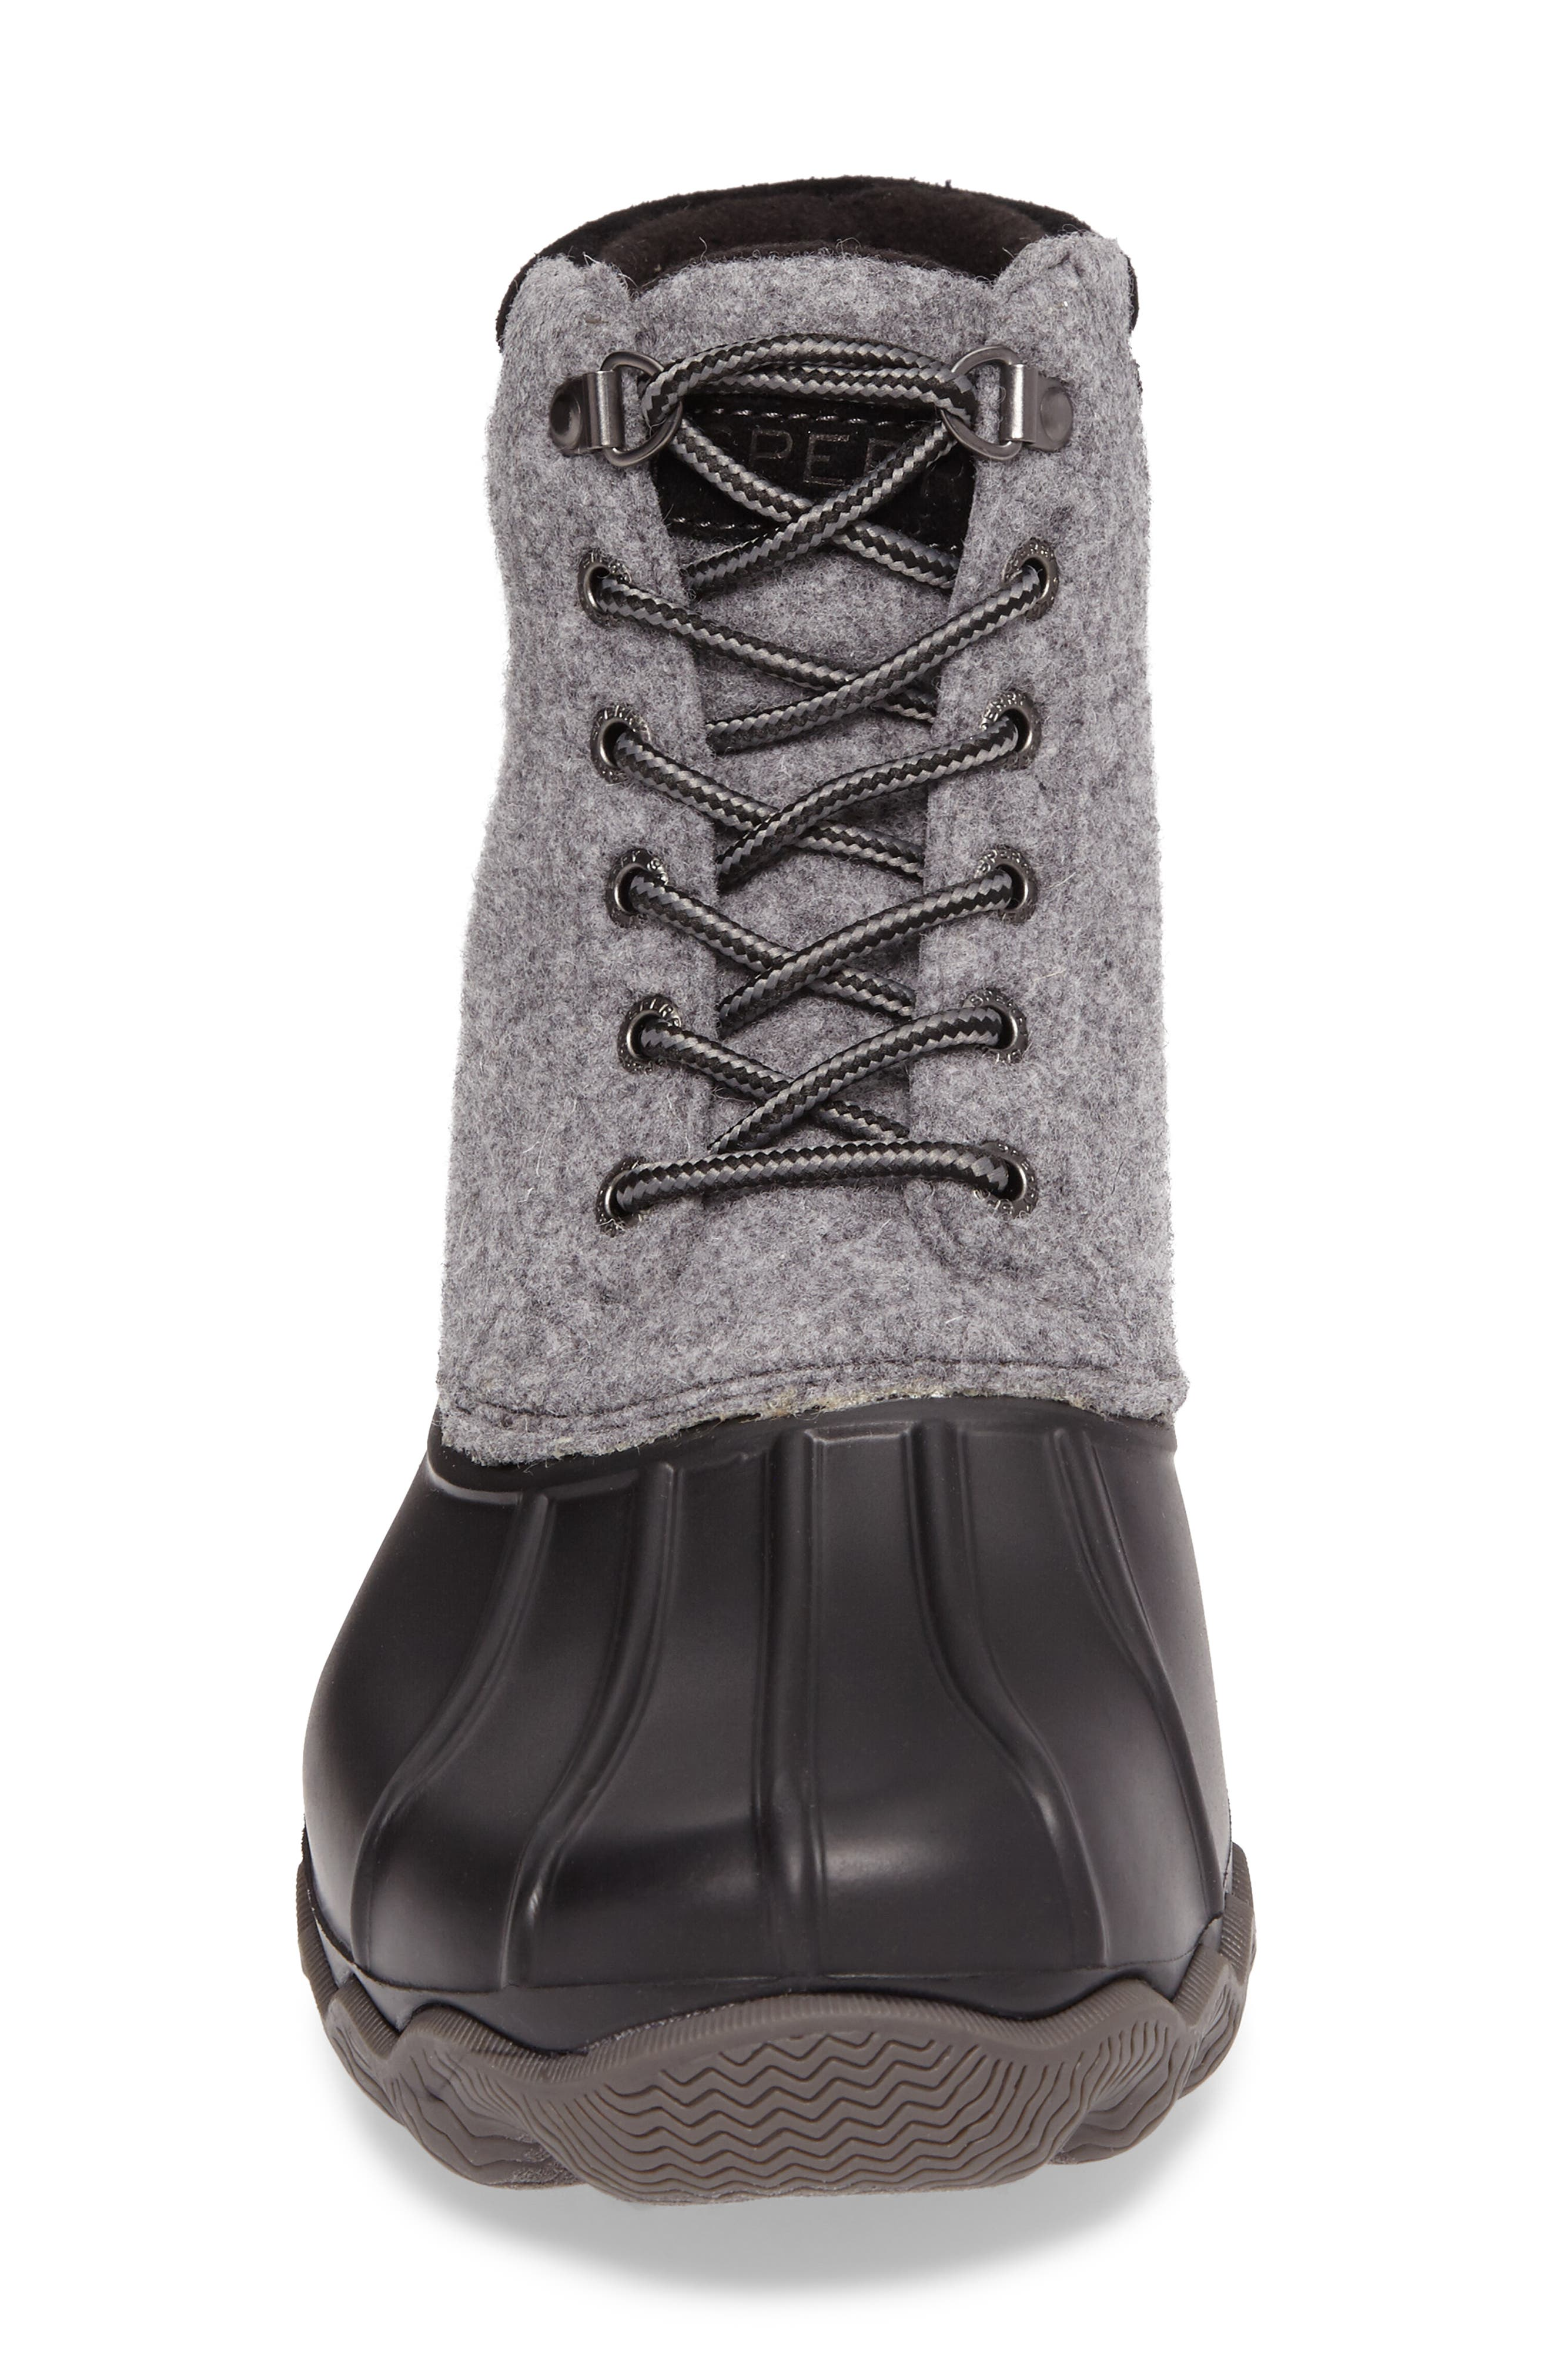 Avenue Rain Boot,                             Alternate thumbnail 4, color,                             Grey Leather